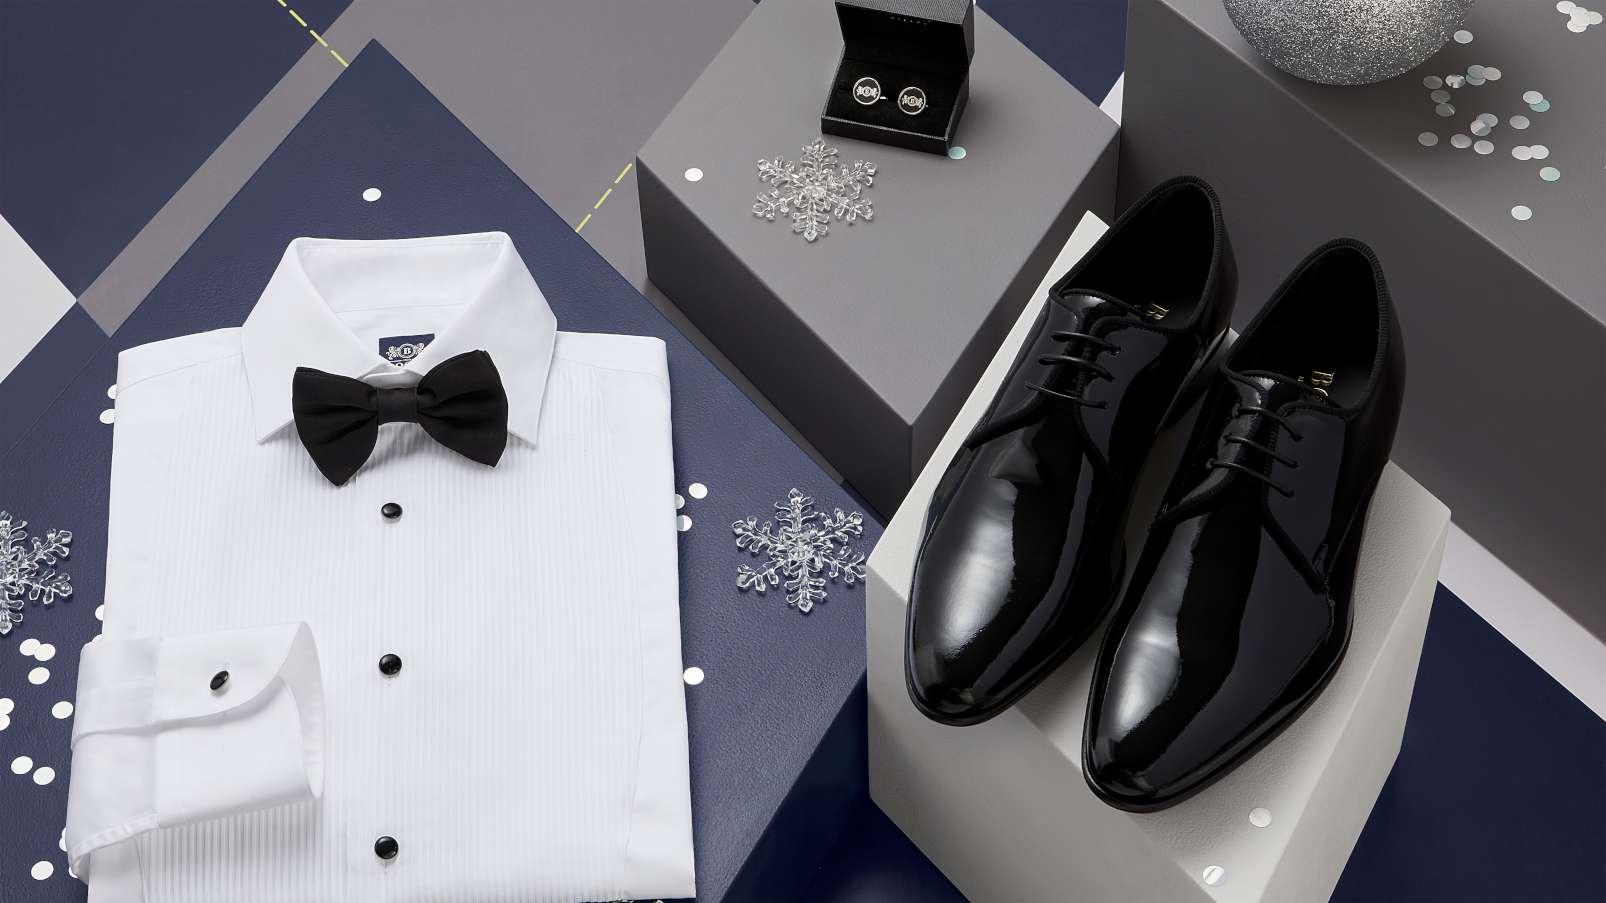 Boggi Milano gifts tuxedo shirt, black silk pre-tied bow tie, studs and cufflinks